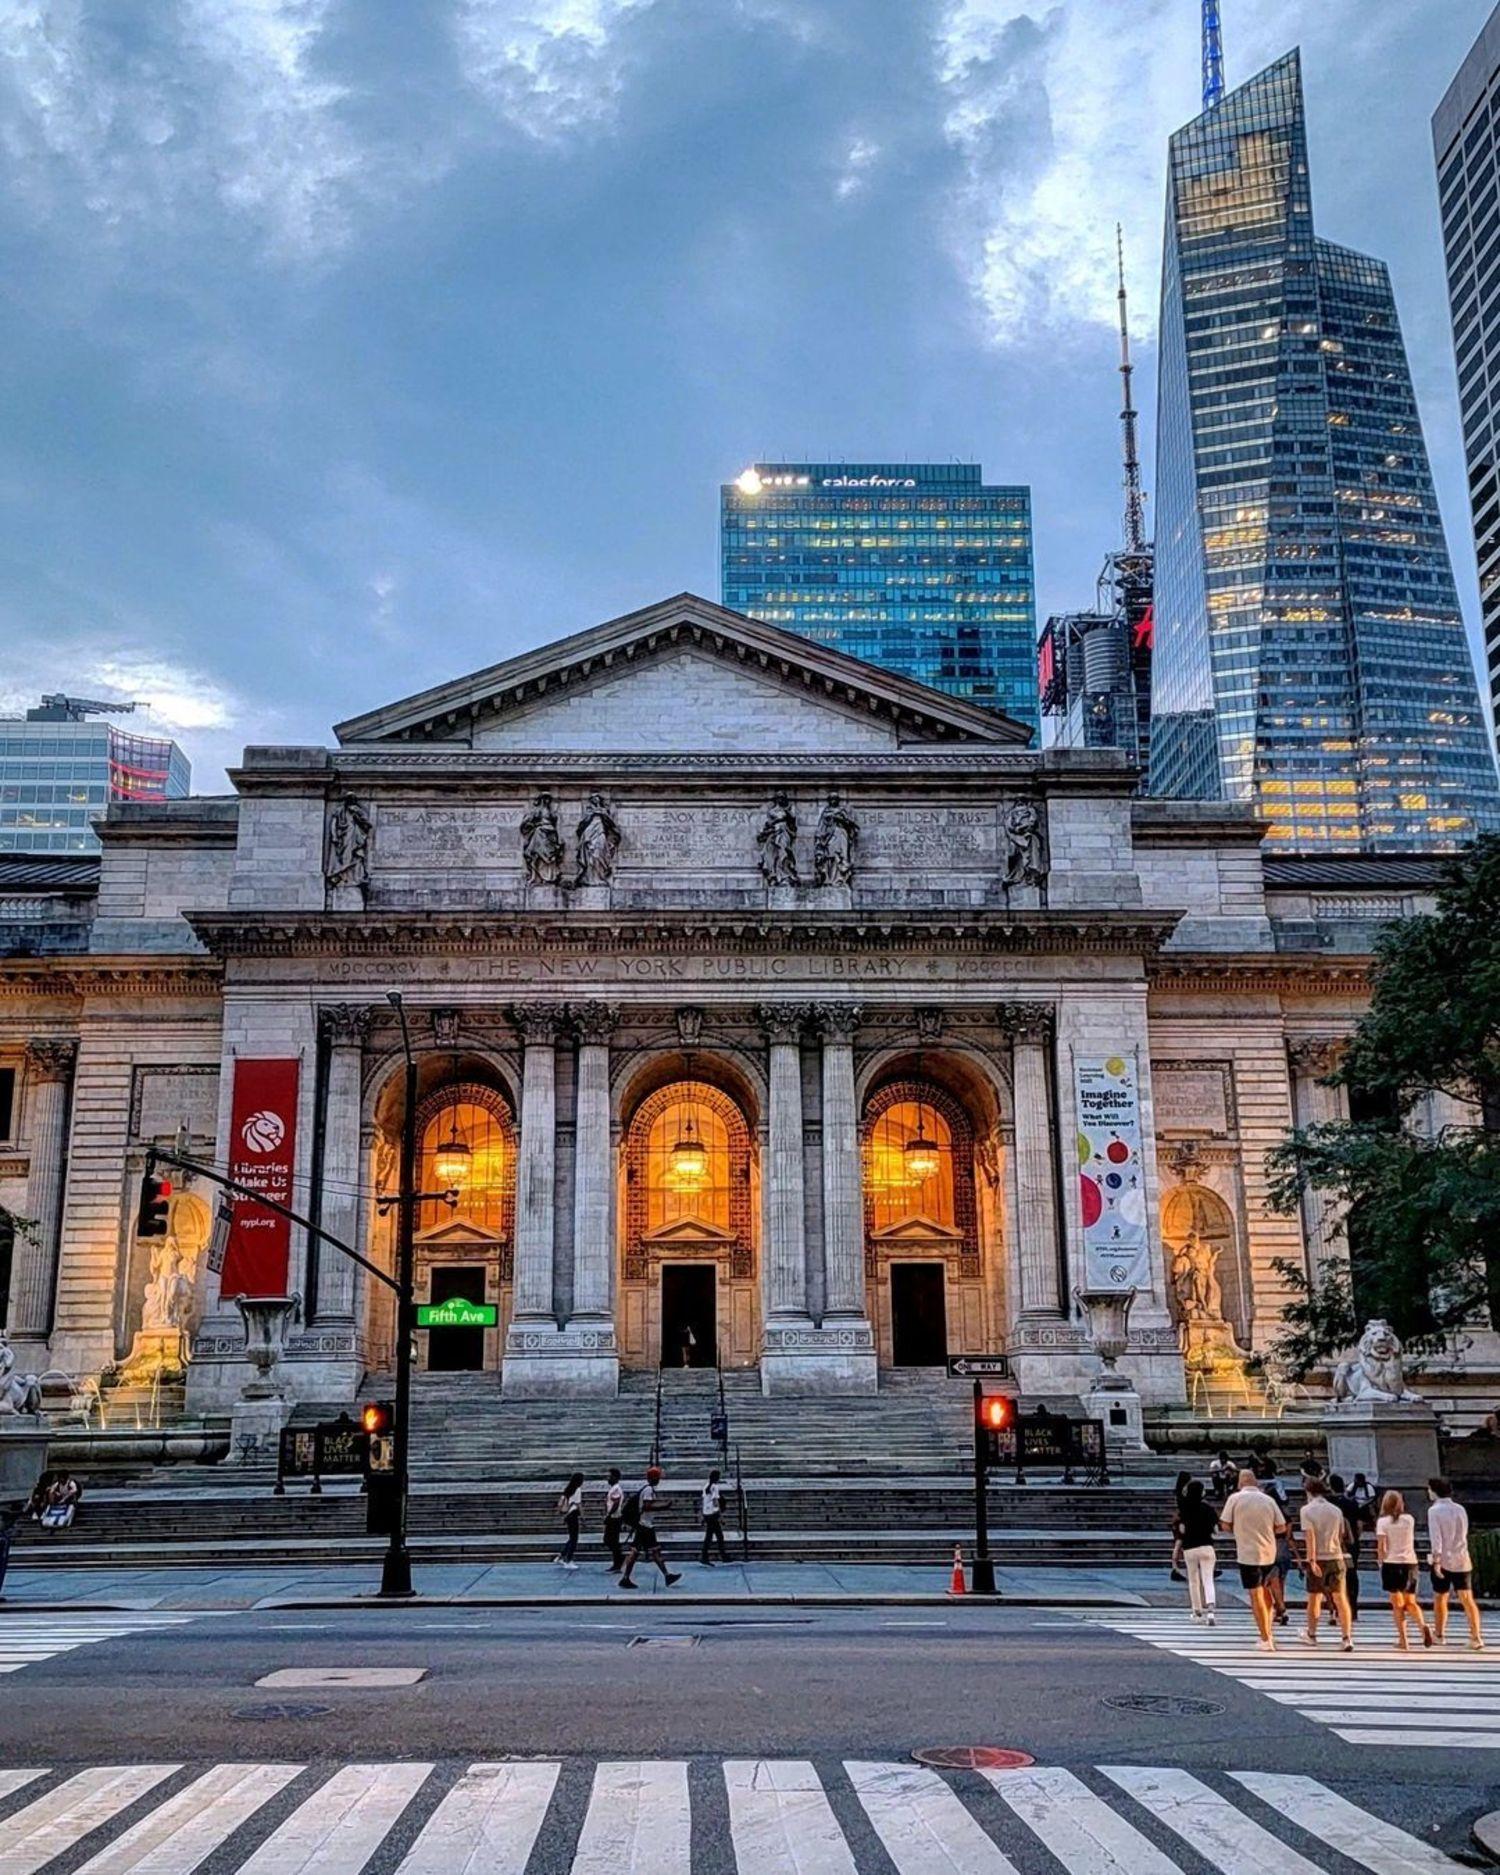 New York Public Library, Midtown, Manhattan